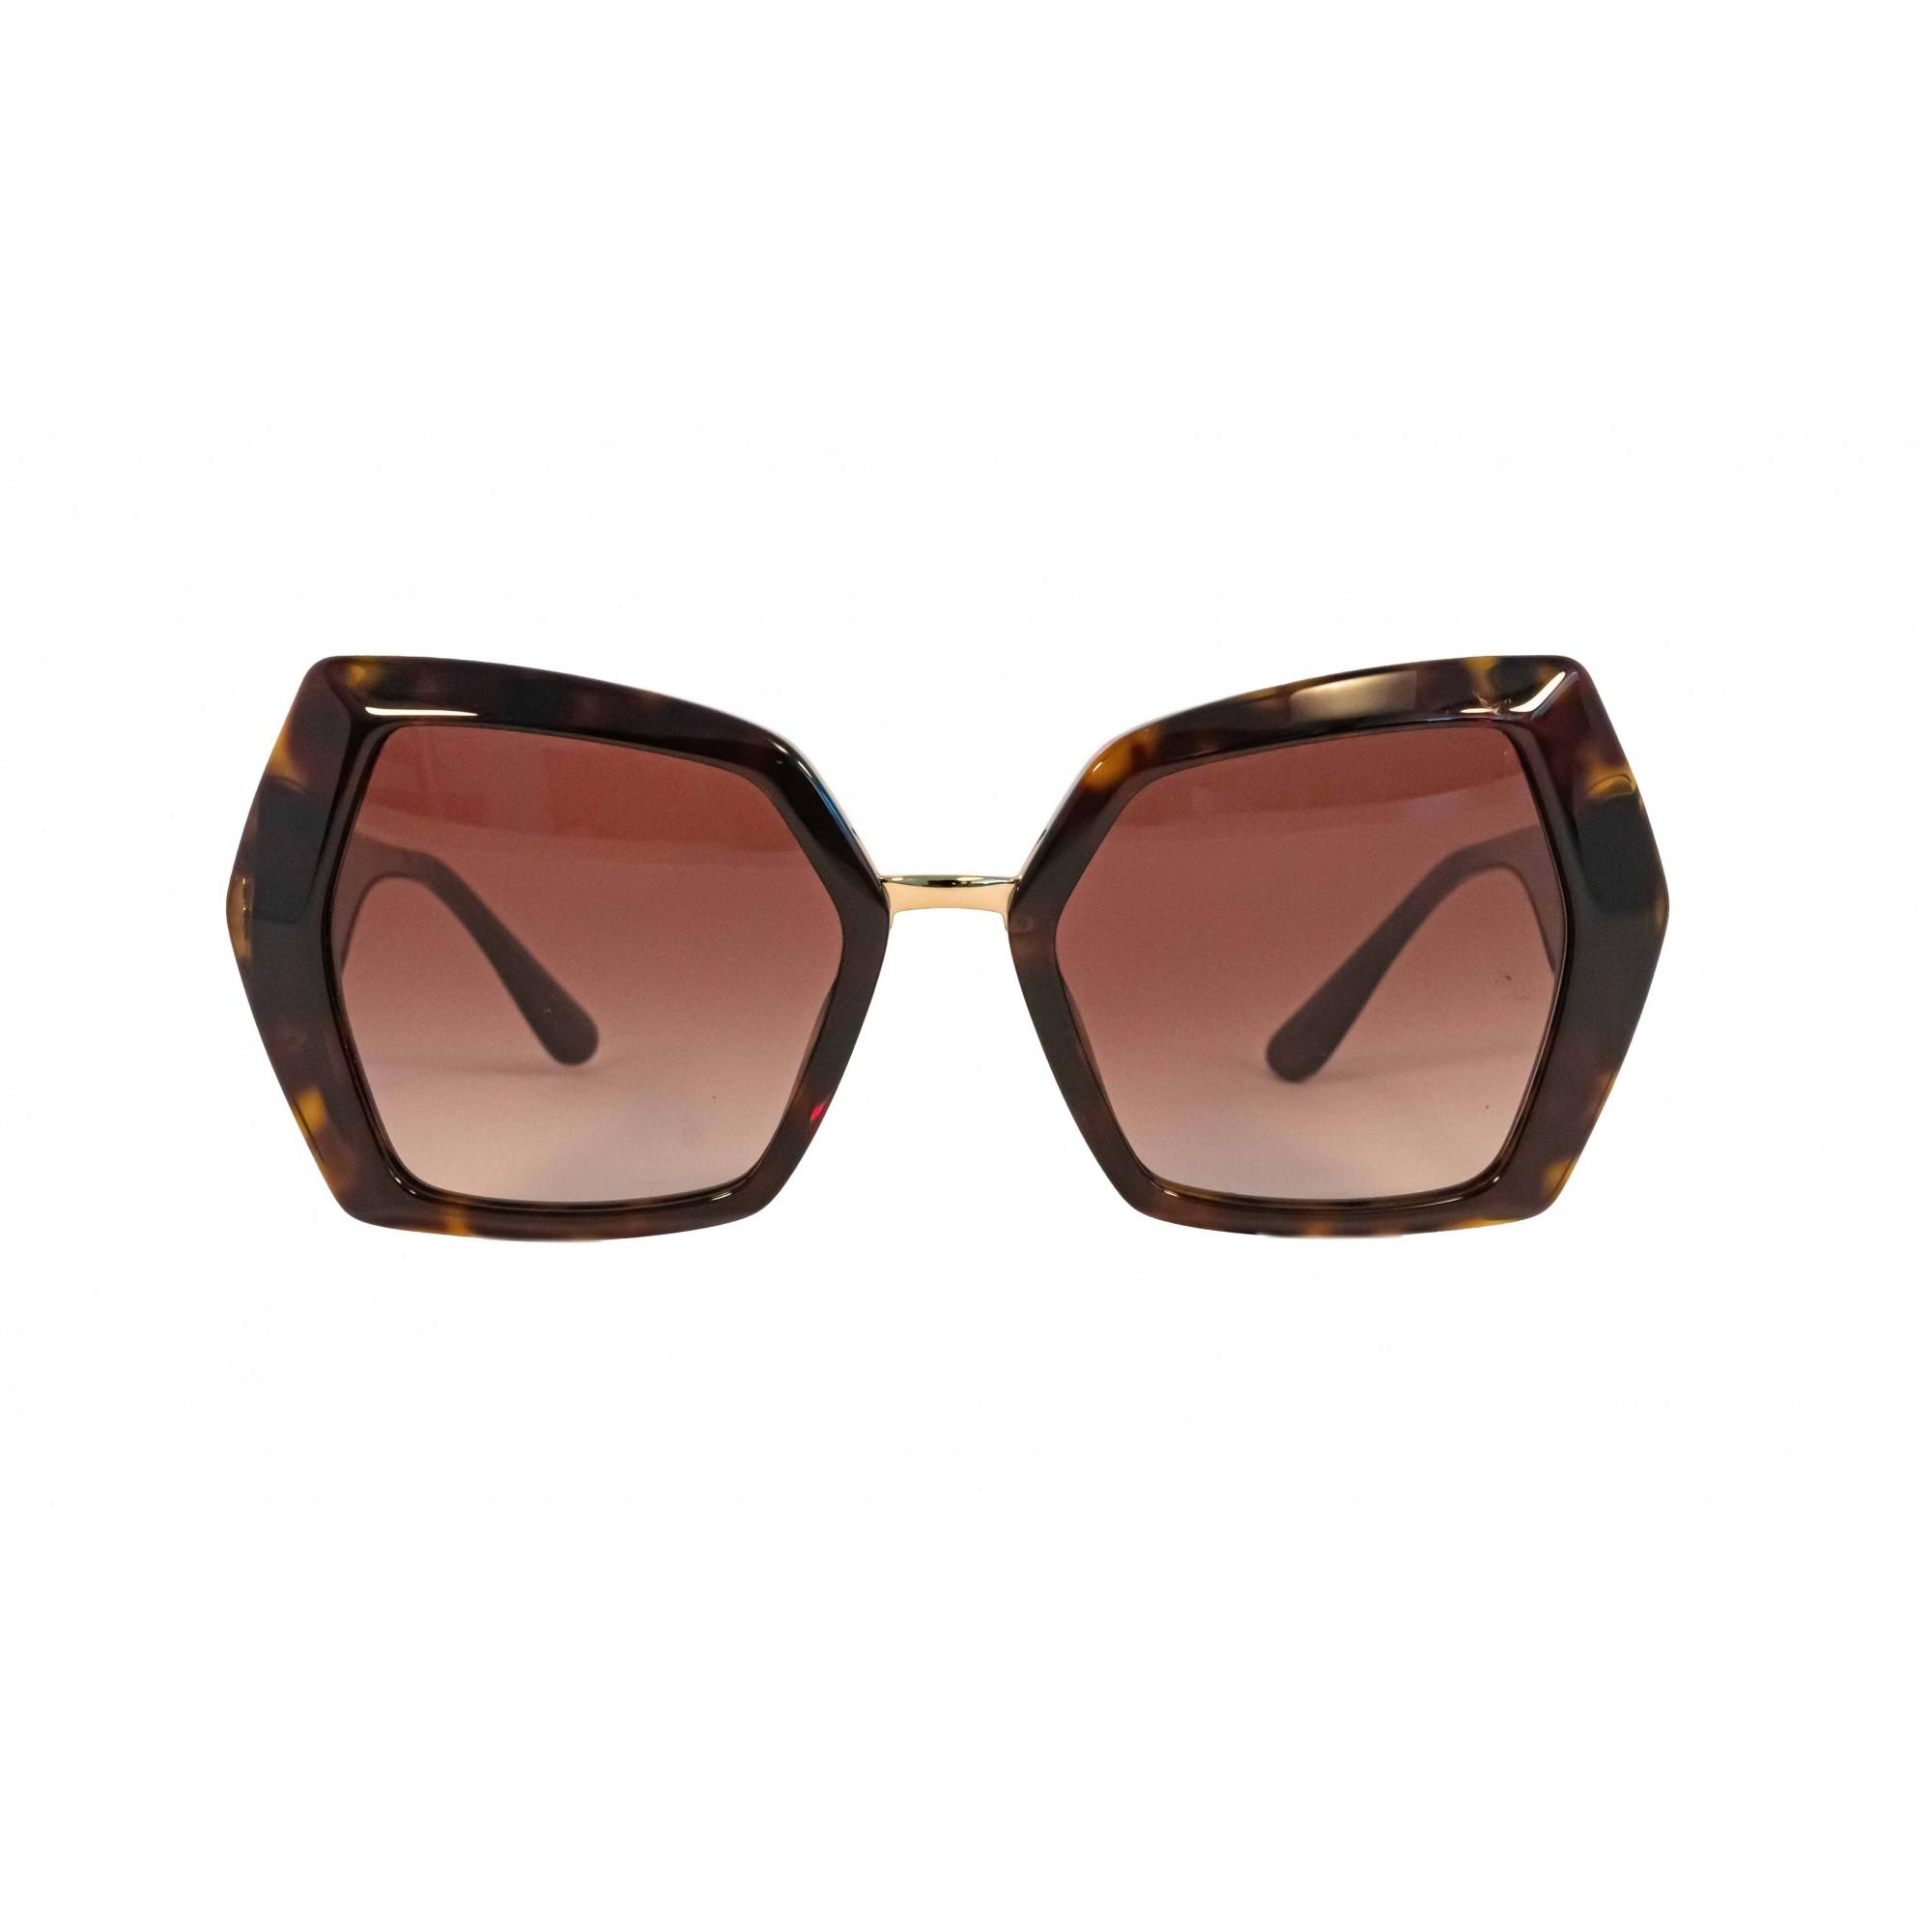 Óculos Dolce&Gabbana Borboleta Dg4377 50213 54 Tartaruga